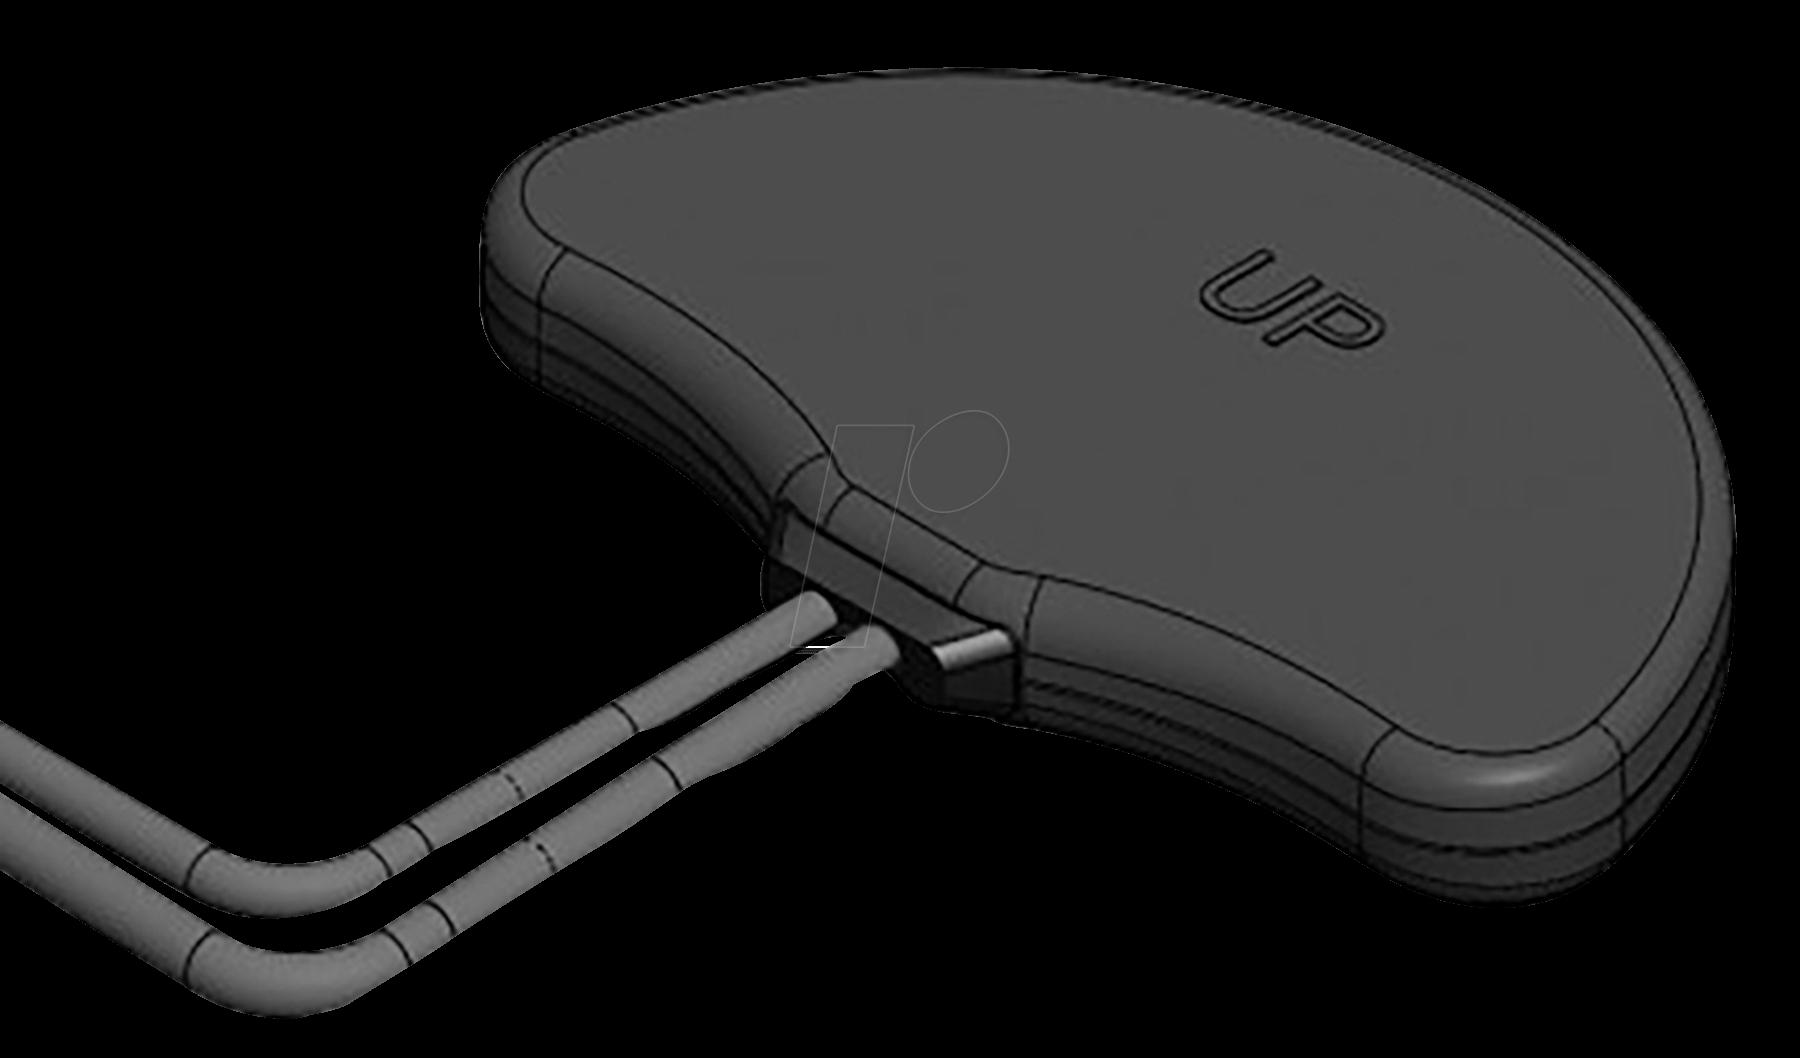 RAYM2-24-58 - Dualband MIMO WIFI Antenna 2,4/5,8GHz